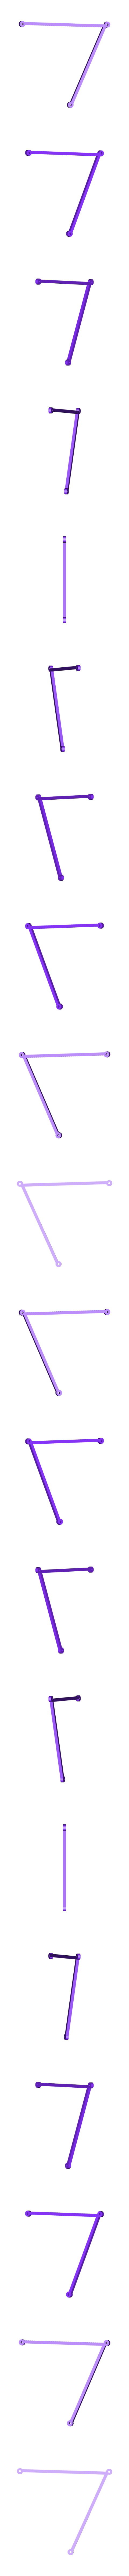 mobile bar triangle.stl Download STL file Modular Mobile System • 3D printable template, jasso